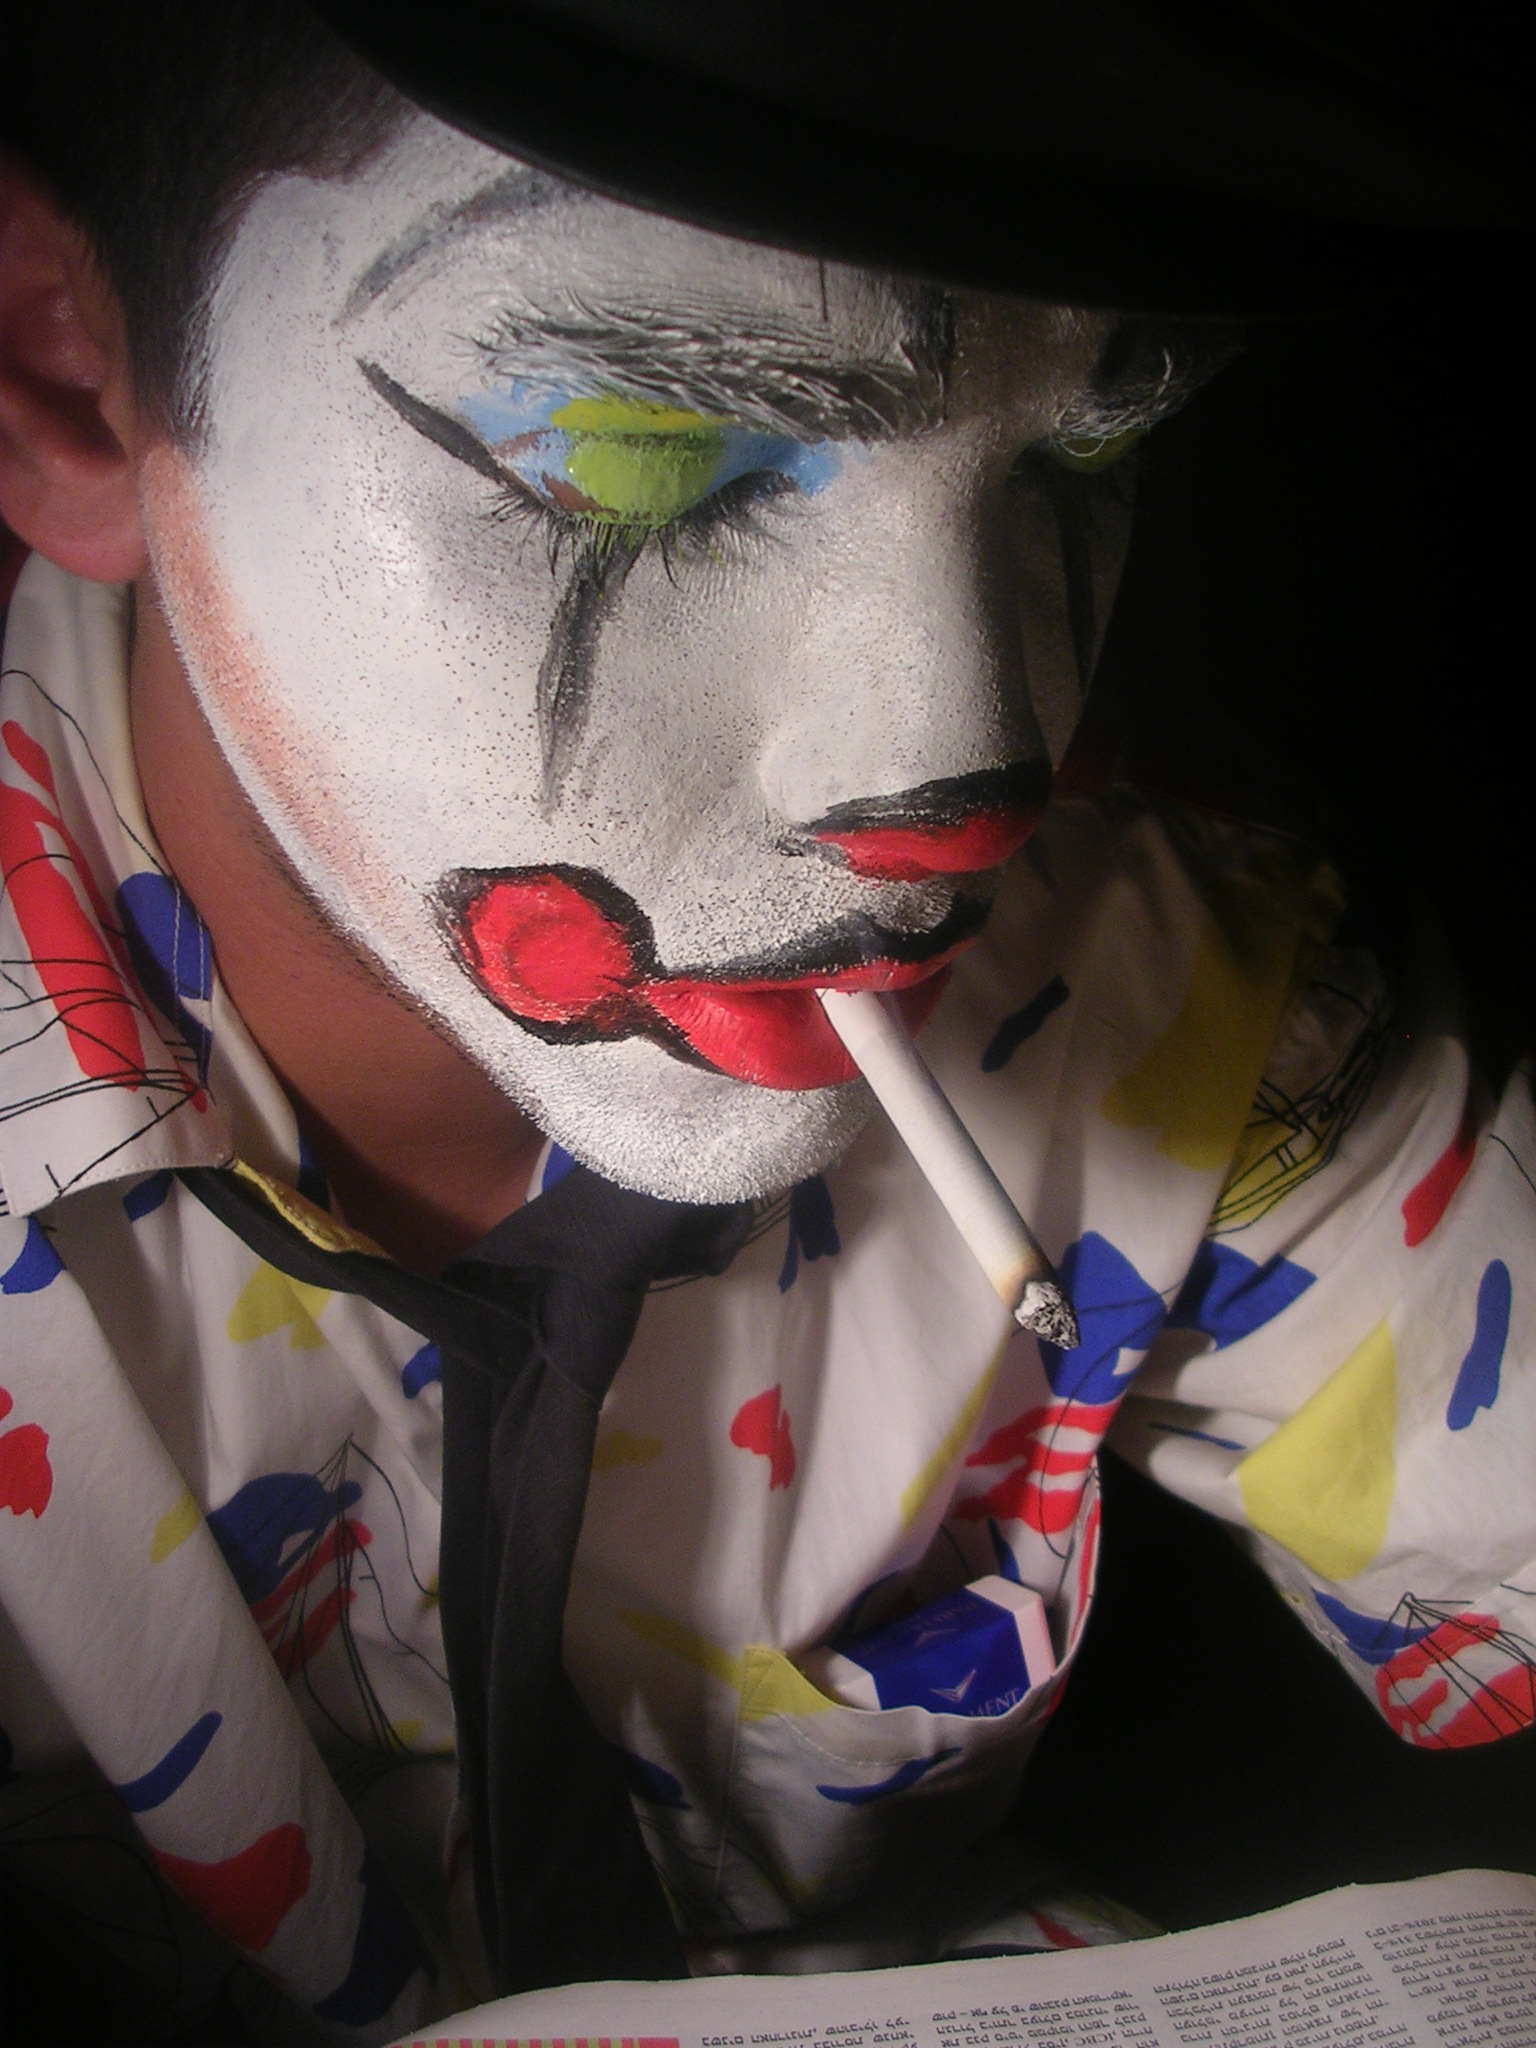 misrable clown 2 by Dannysucks